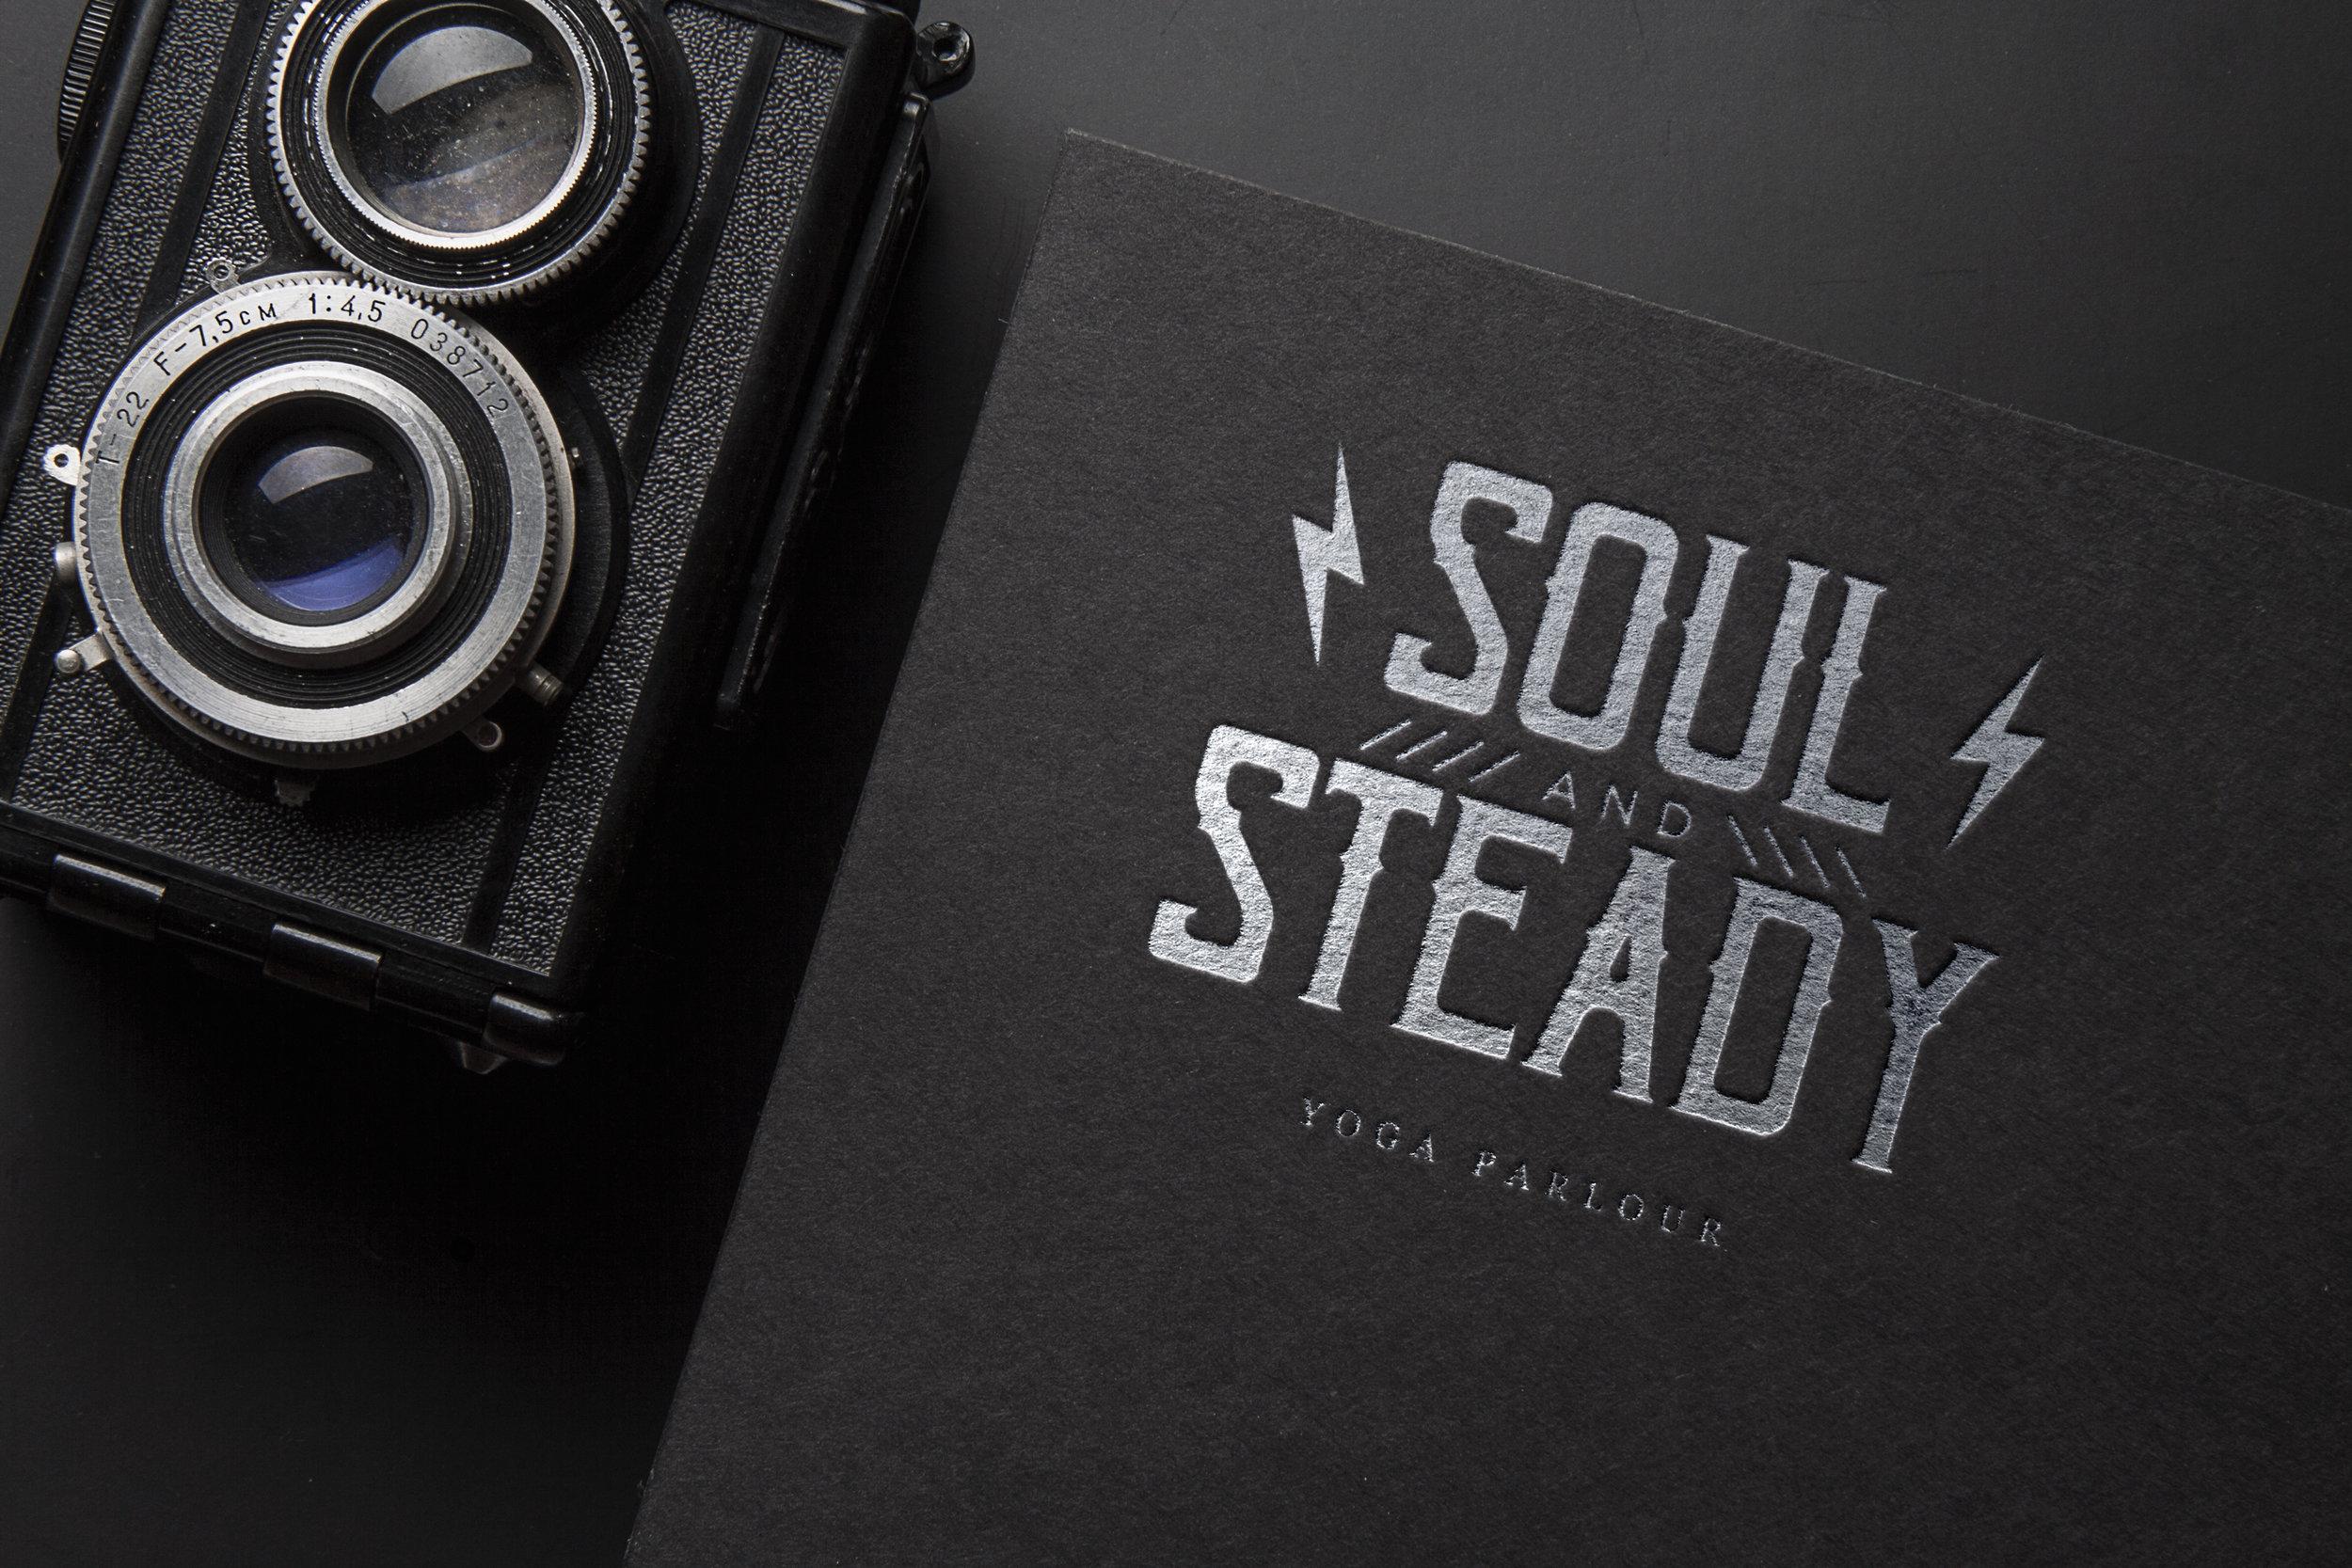 SoulANDSteady Texture.jpg